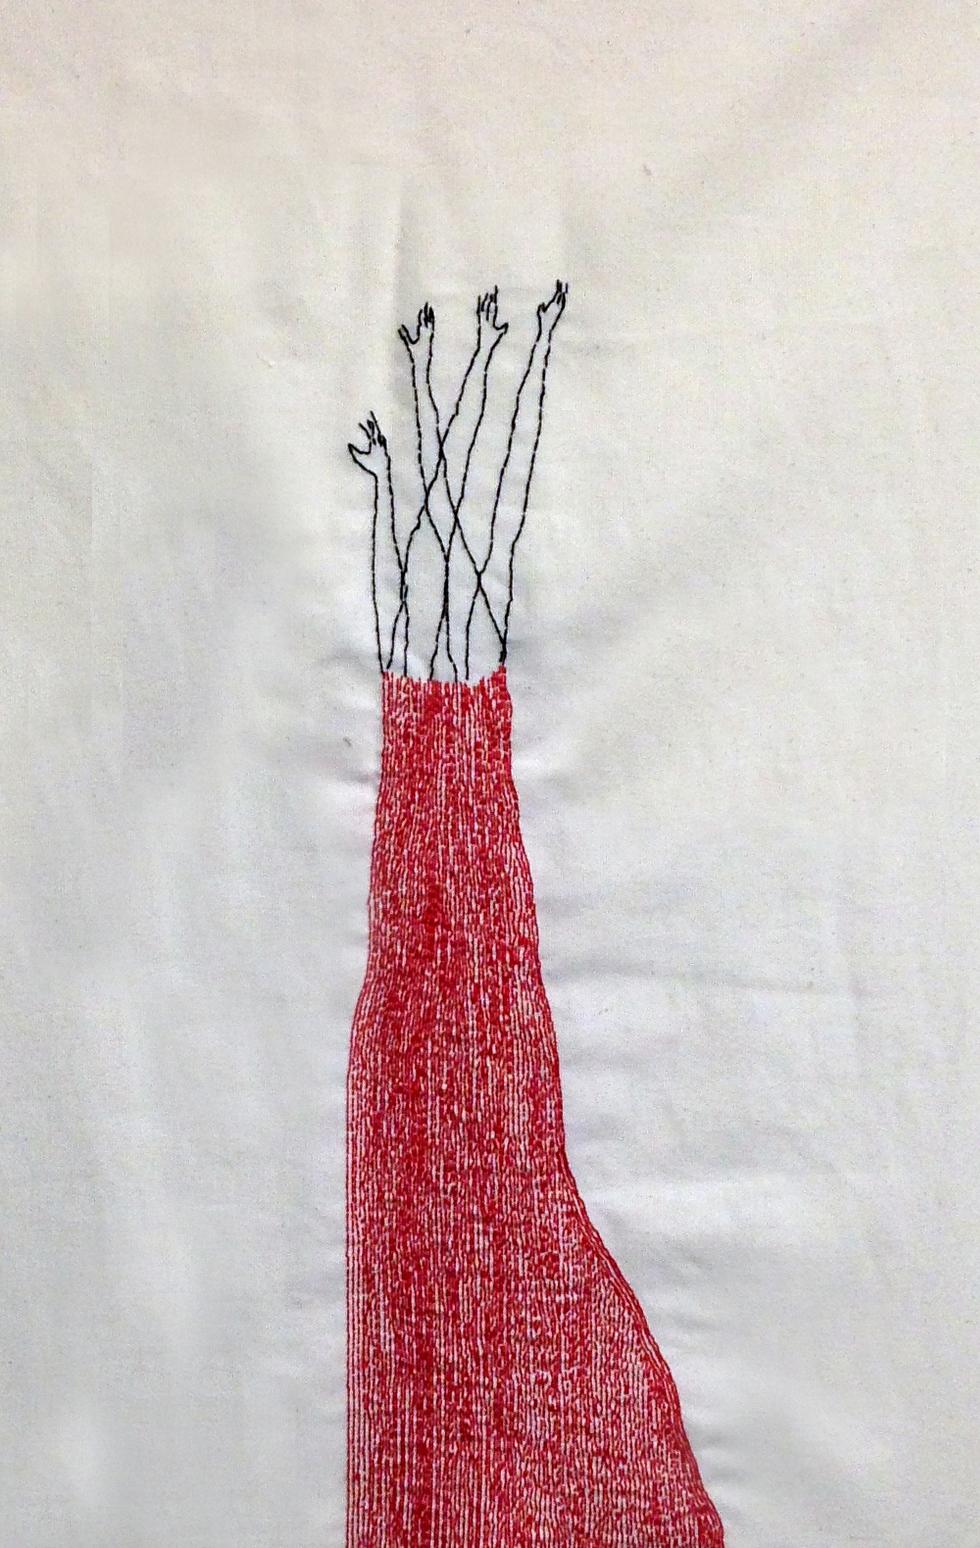 Sequence II | Hand sewn on Fabric | 40x60 cm